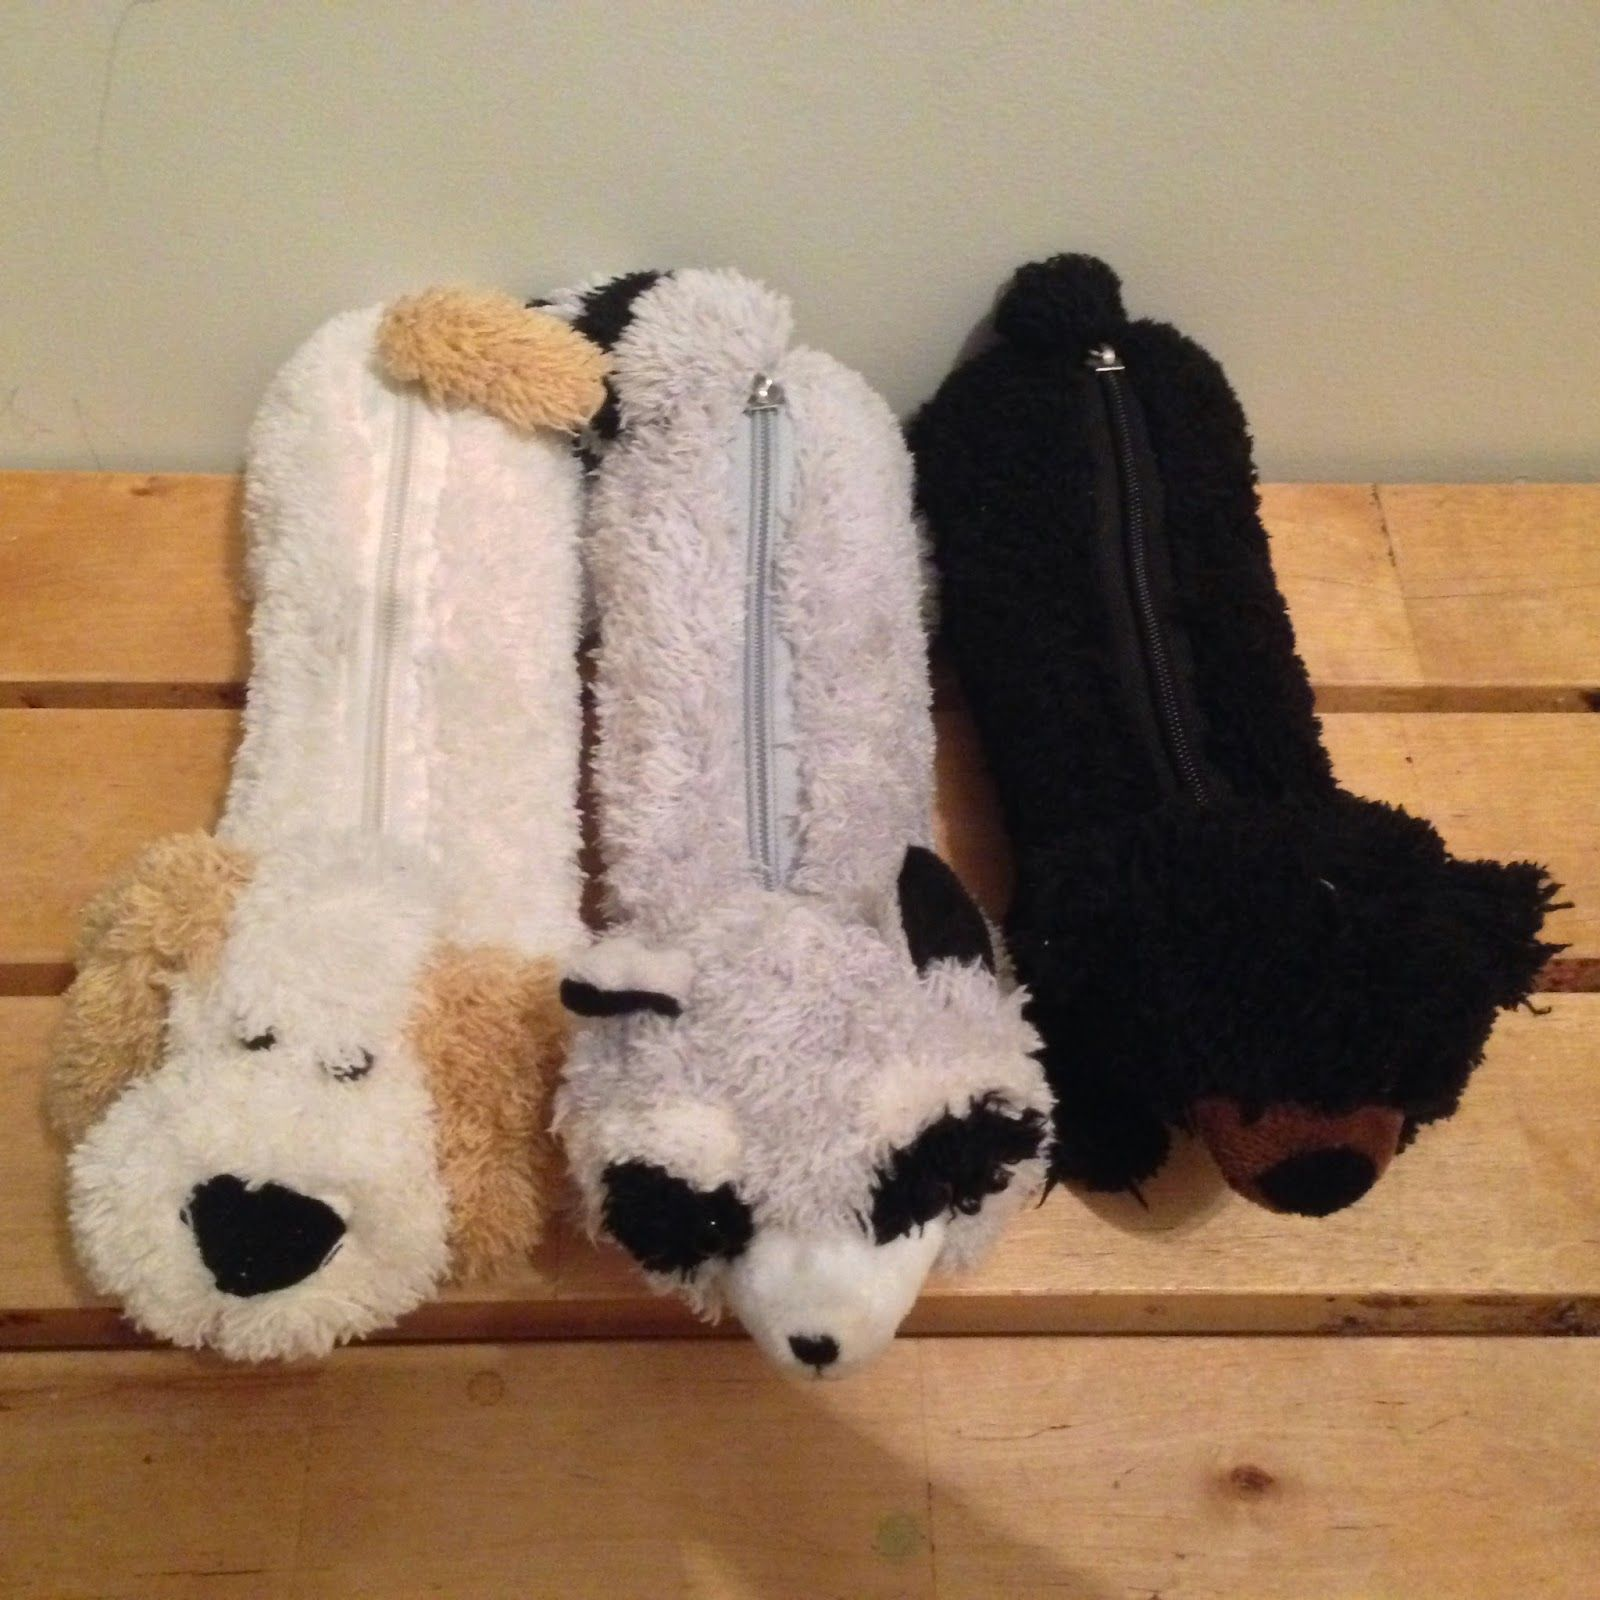 Diy Weighted Stuffed Animals Homemade Fidget Lap Pads For Sensory